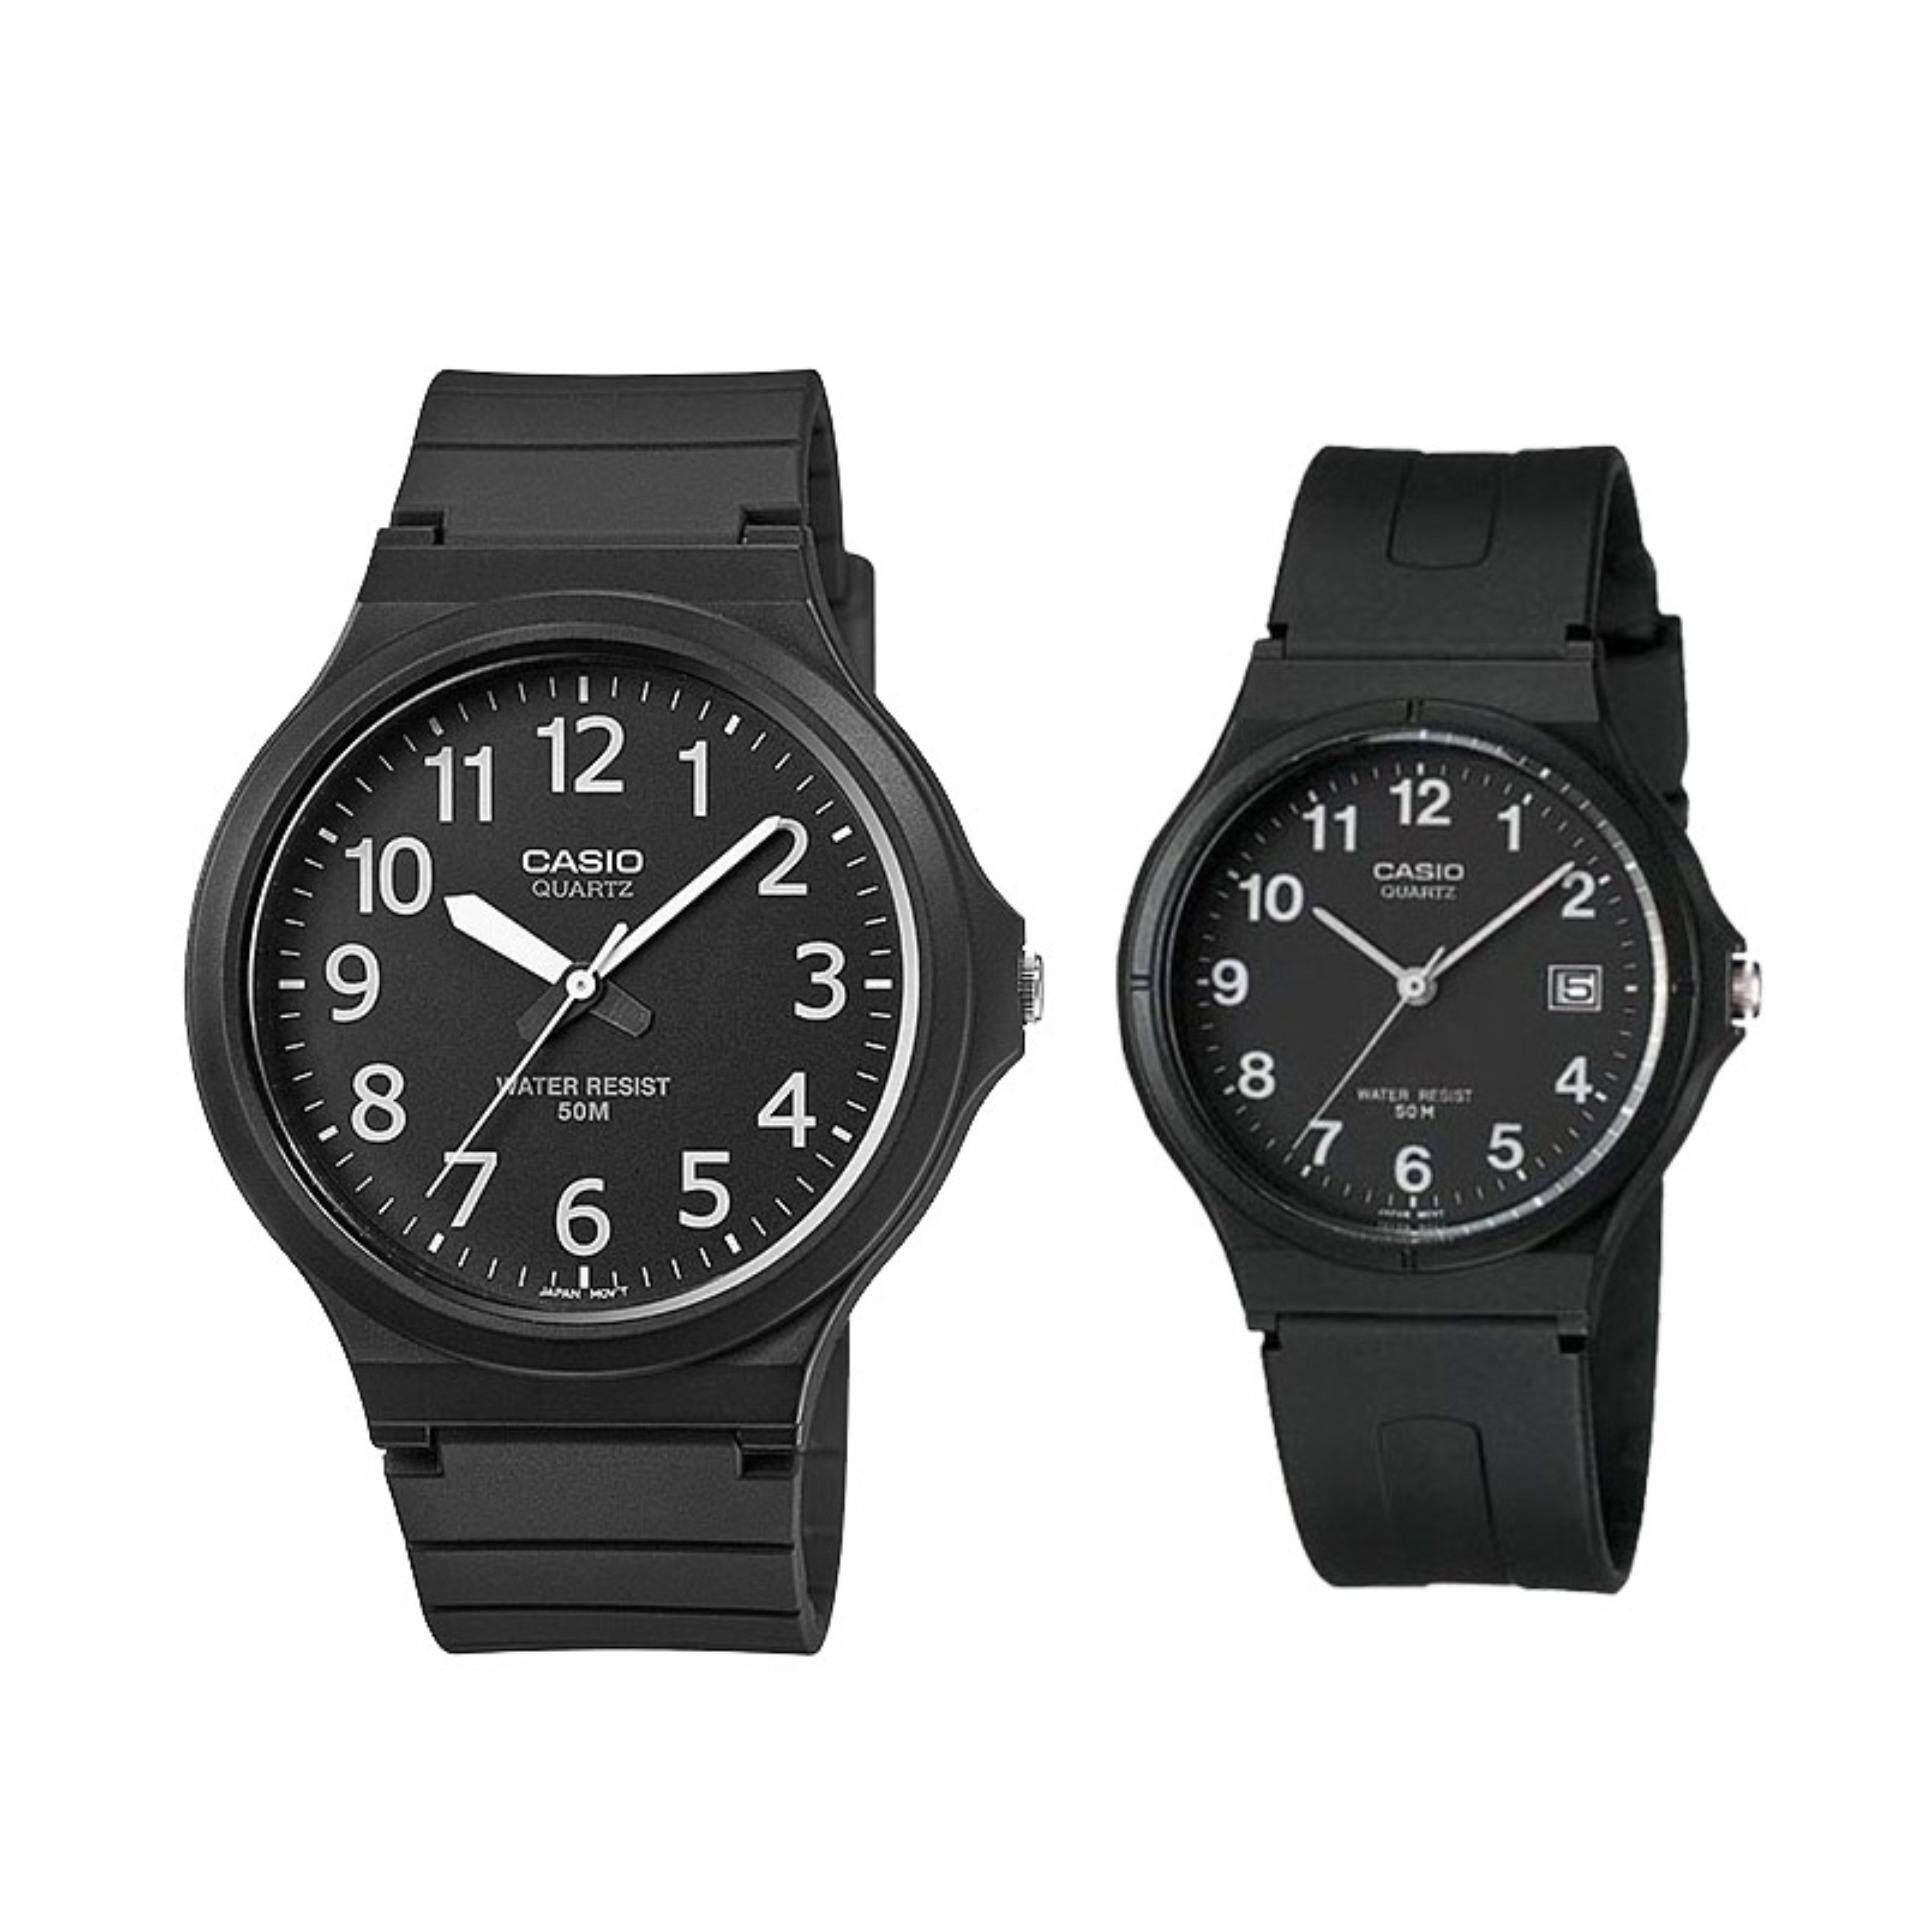 Casio Couple Mtp Dan Ltp V004d 1b Jam Tangan Silver Strap 1170a 7a Stainless Steel Band Watch Original Source Mw